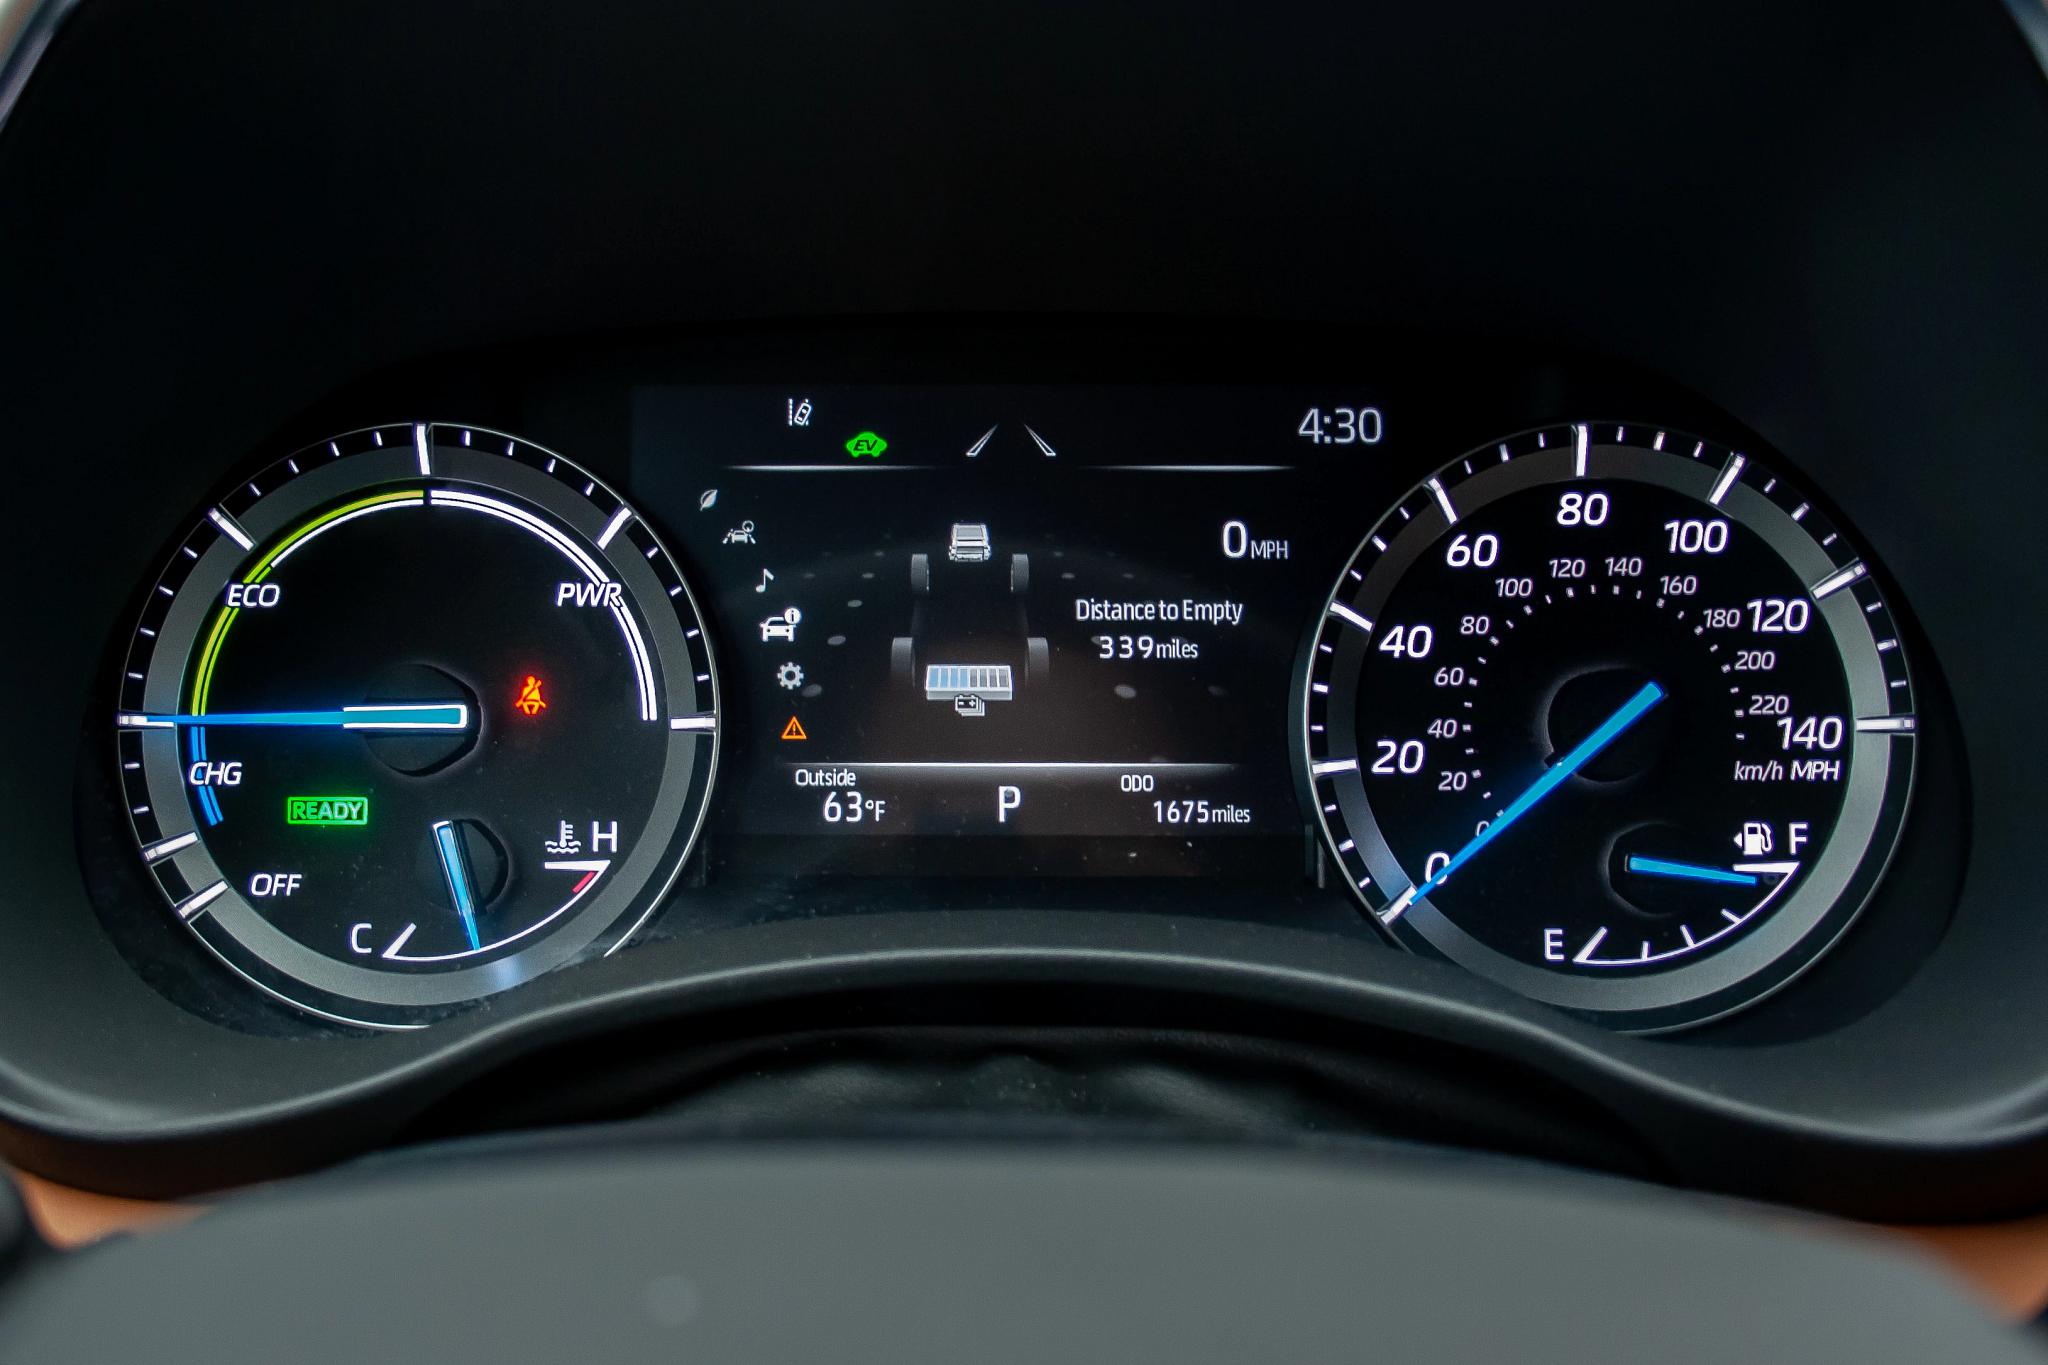 toyota-highlander-hybrid-2020-04-instrument-panel--interior.jpg